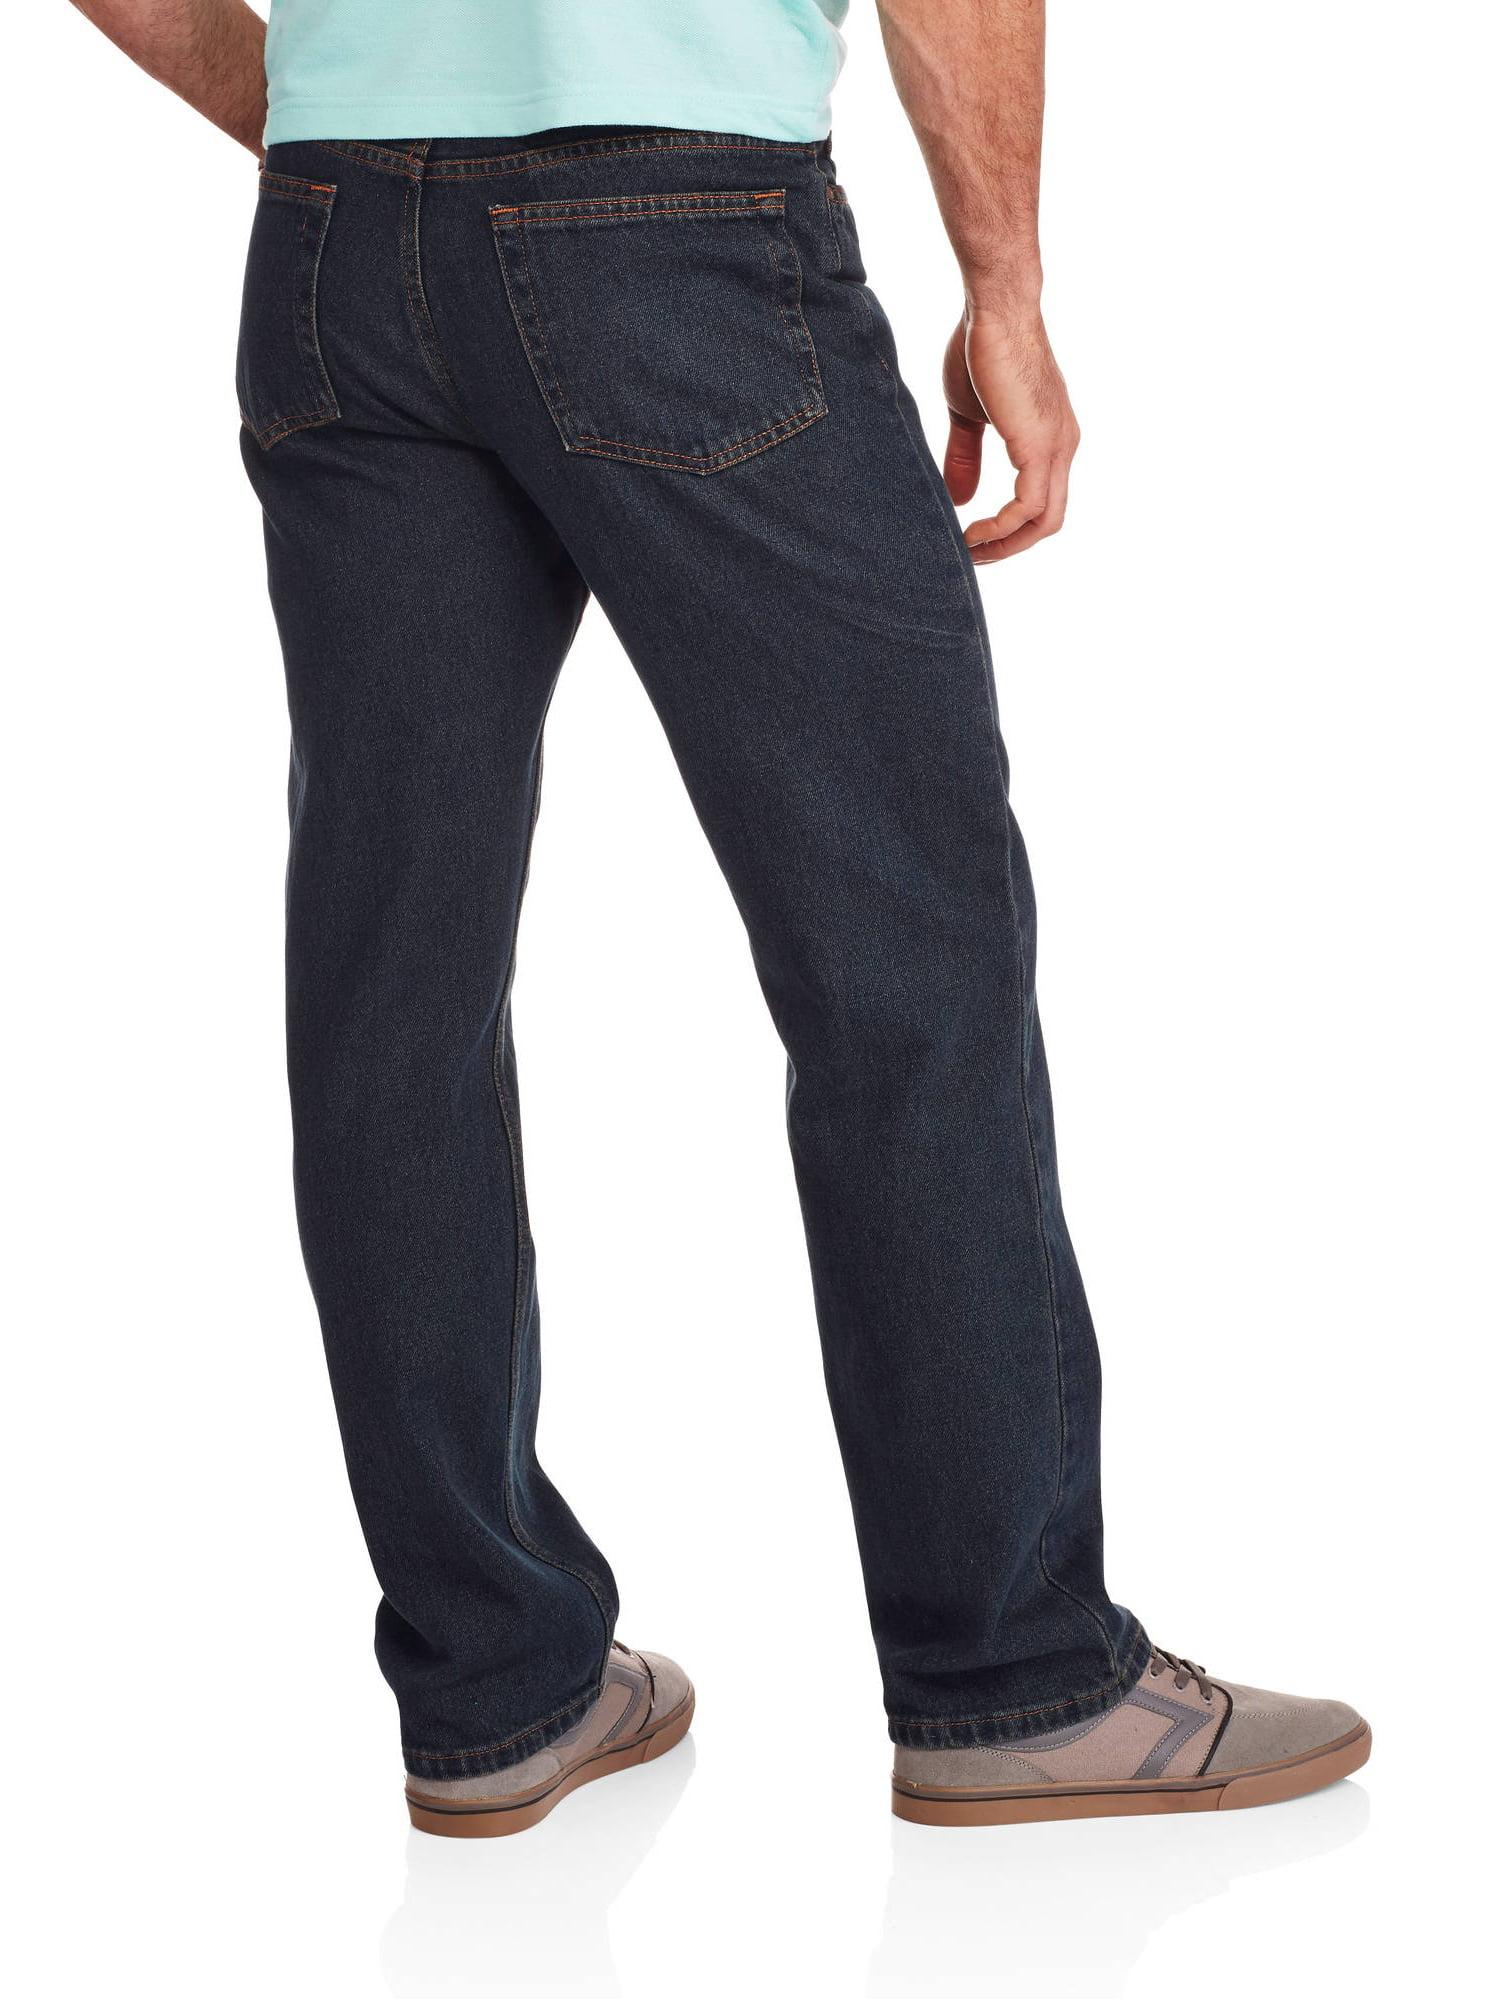 BRAND NEW MEN/'S FADED GLORY BLACK DENIM JEANS 38X34 CLASSIC FIT STRAIGHT LEG